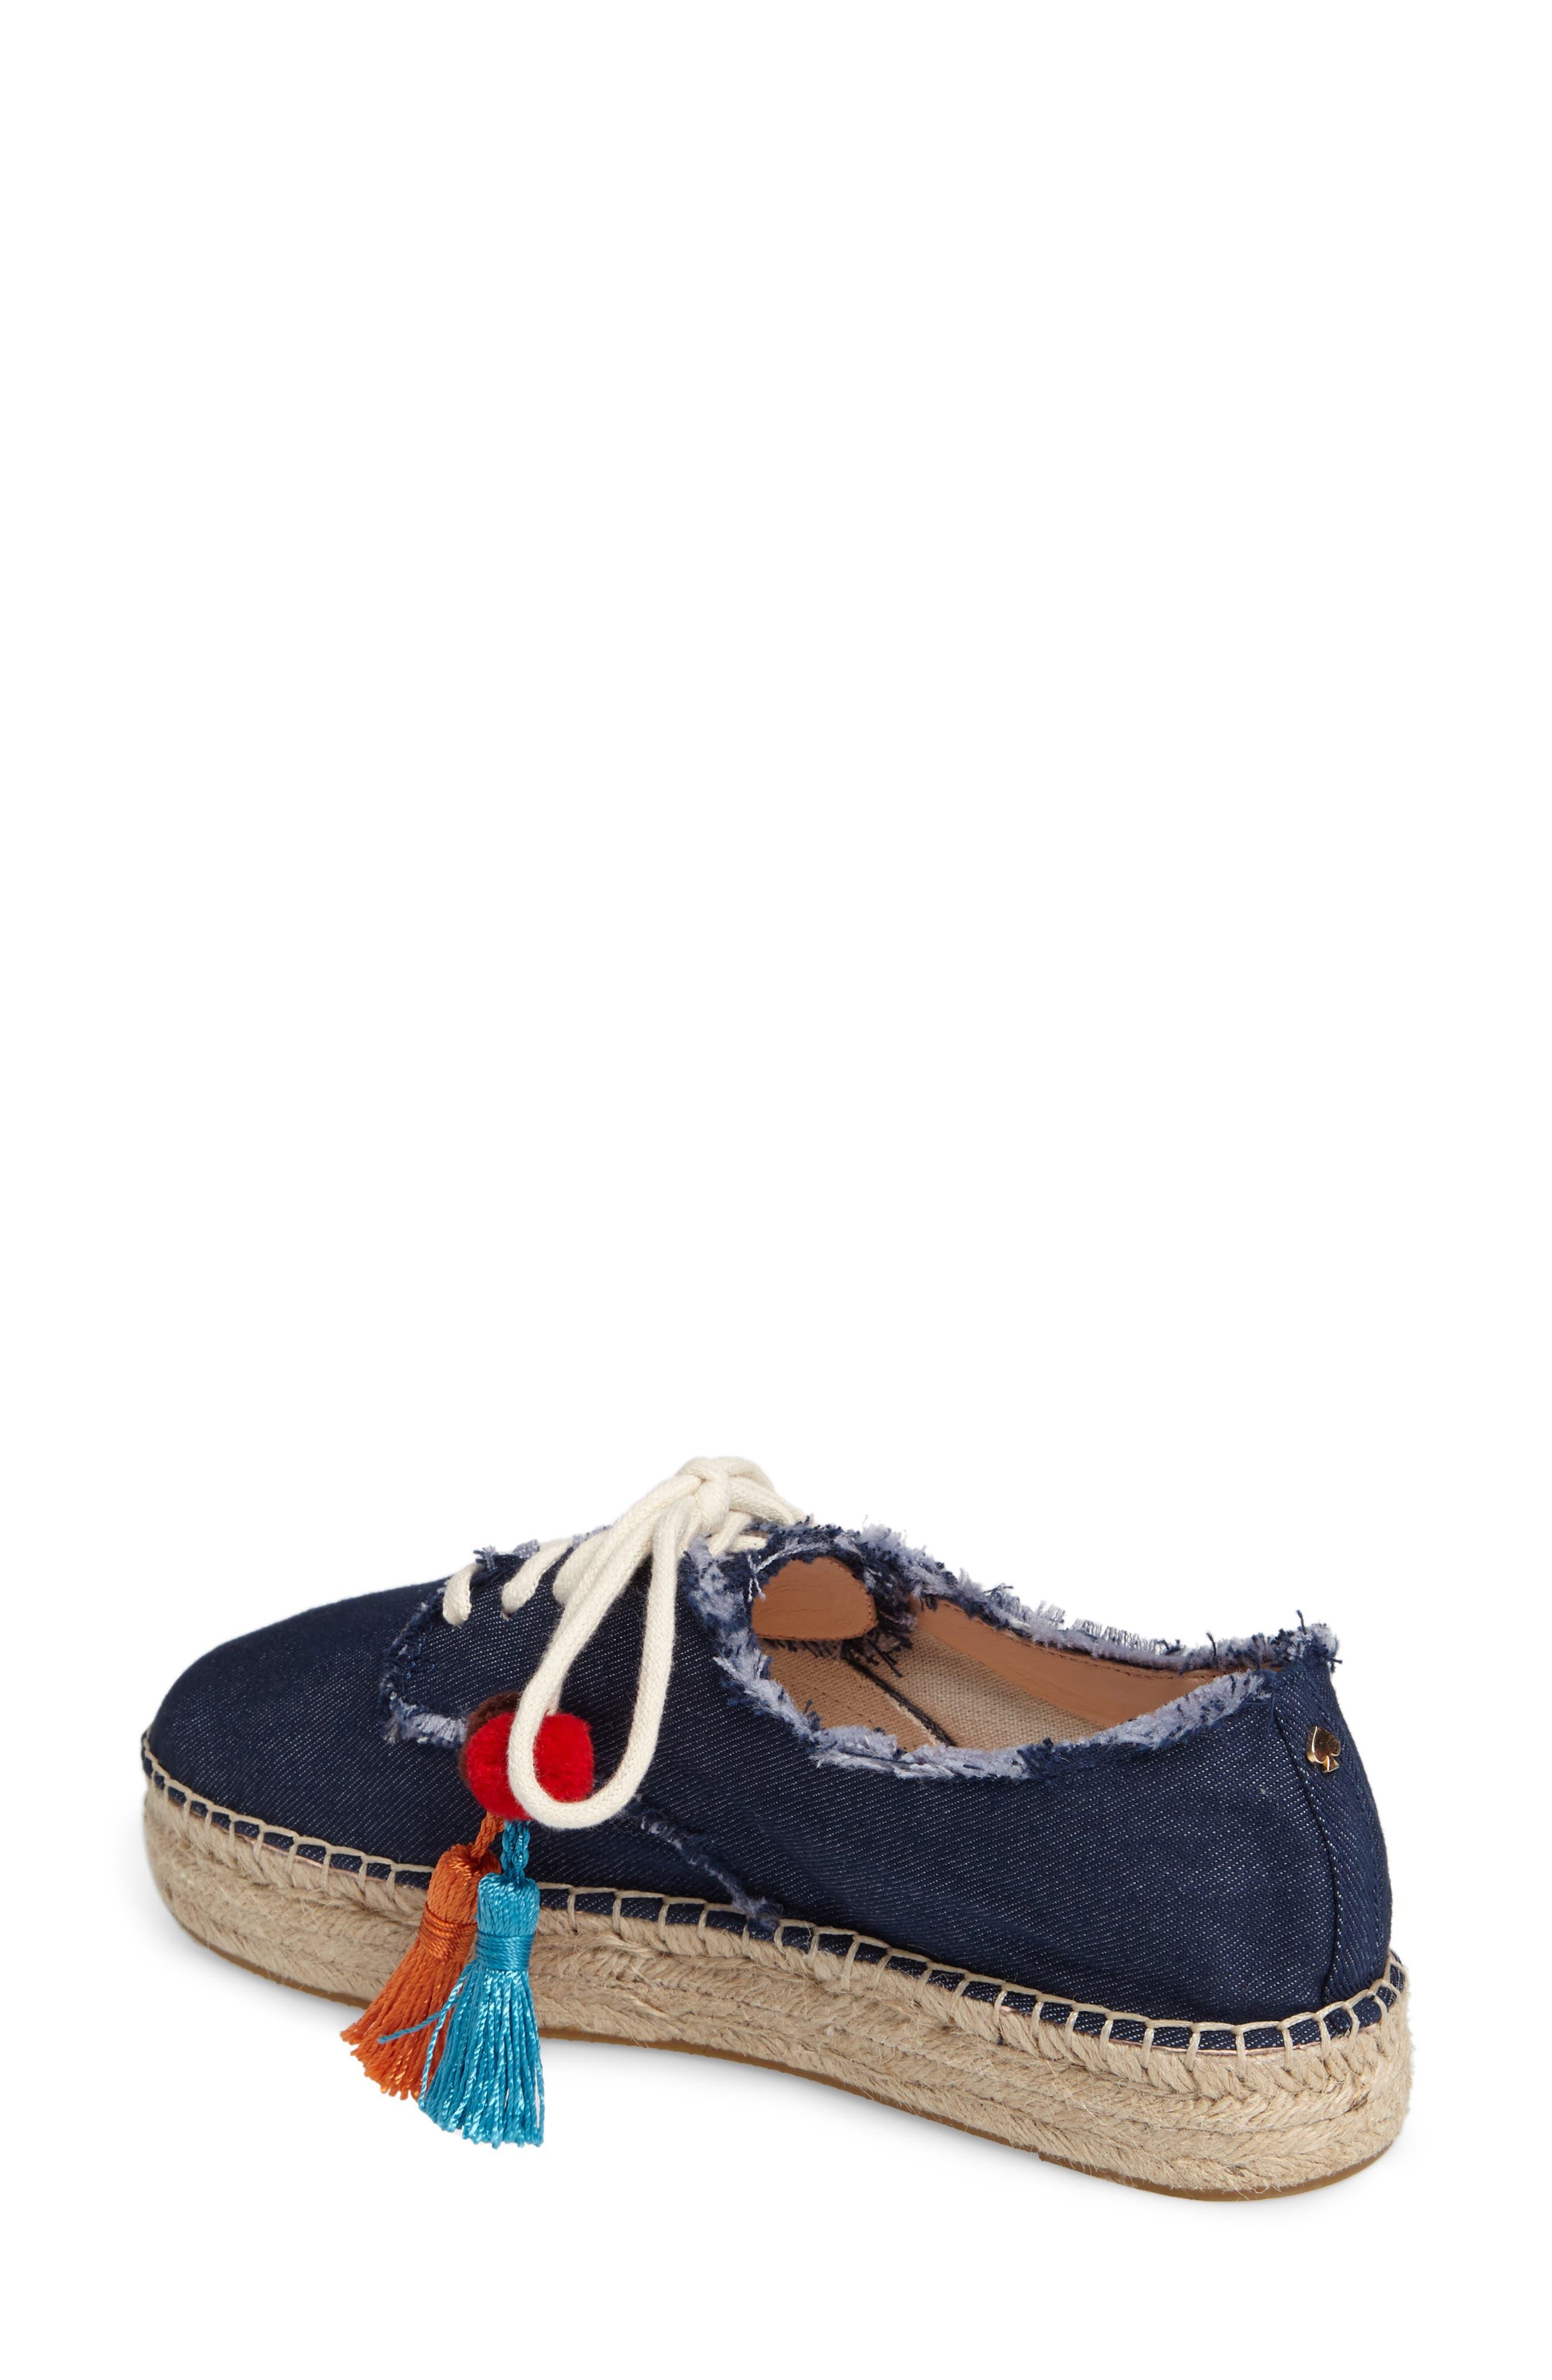 lane espadrille platform sneaker,                             Alternate thumbnail 2, color,                             Blue Jeans